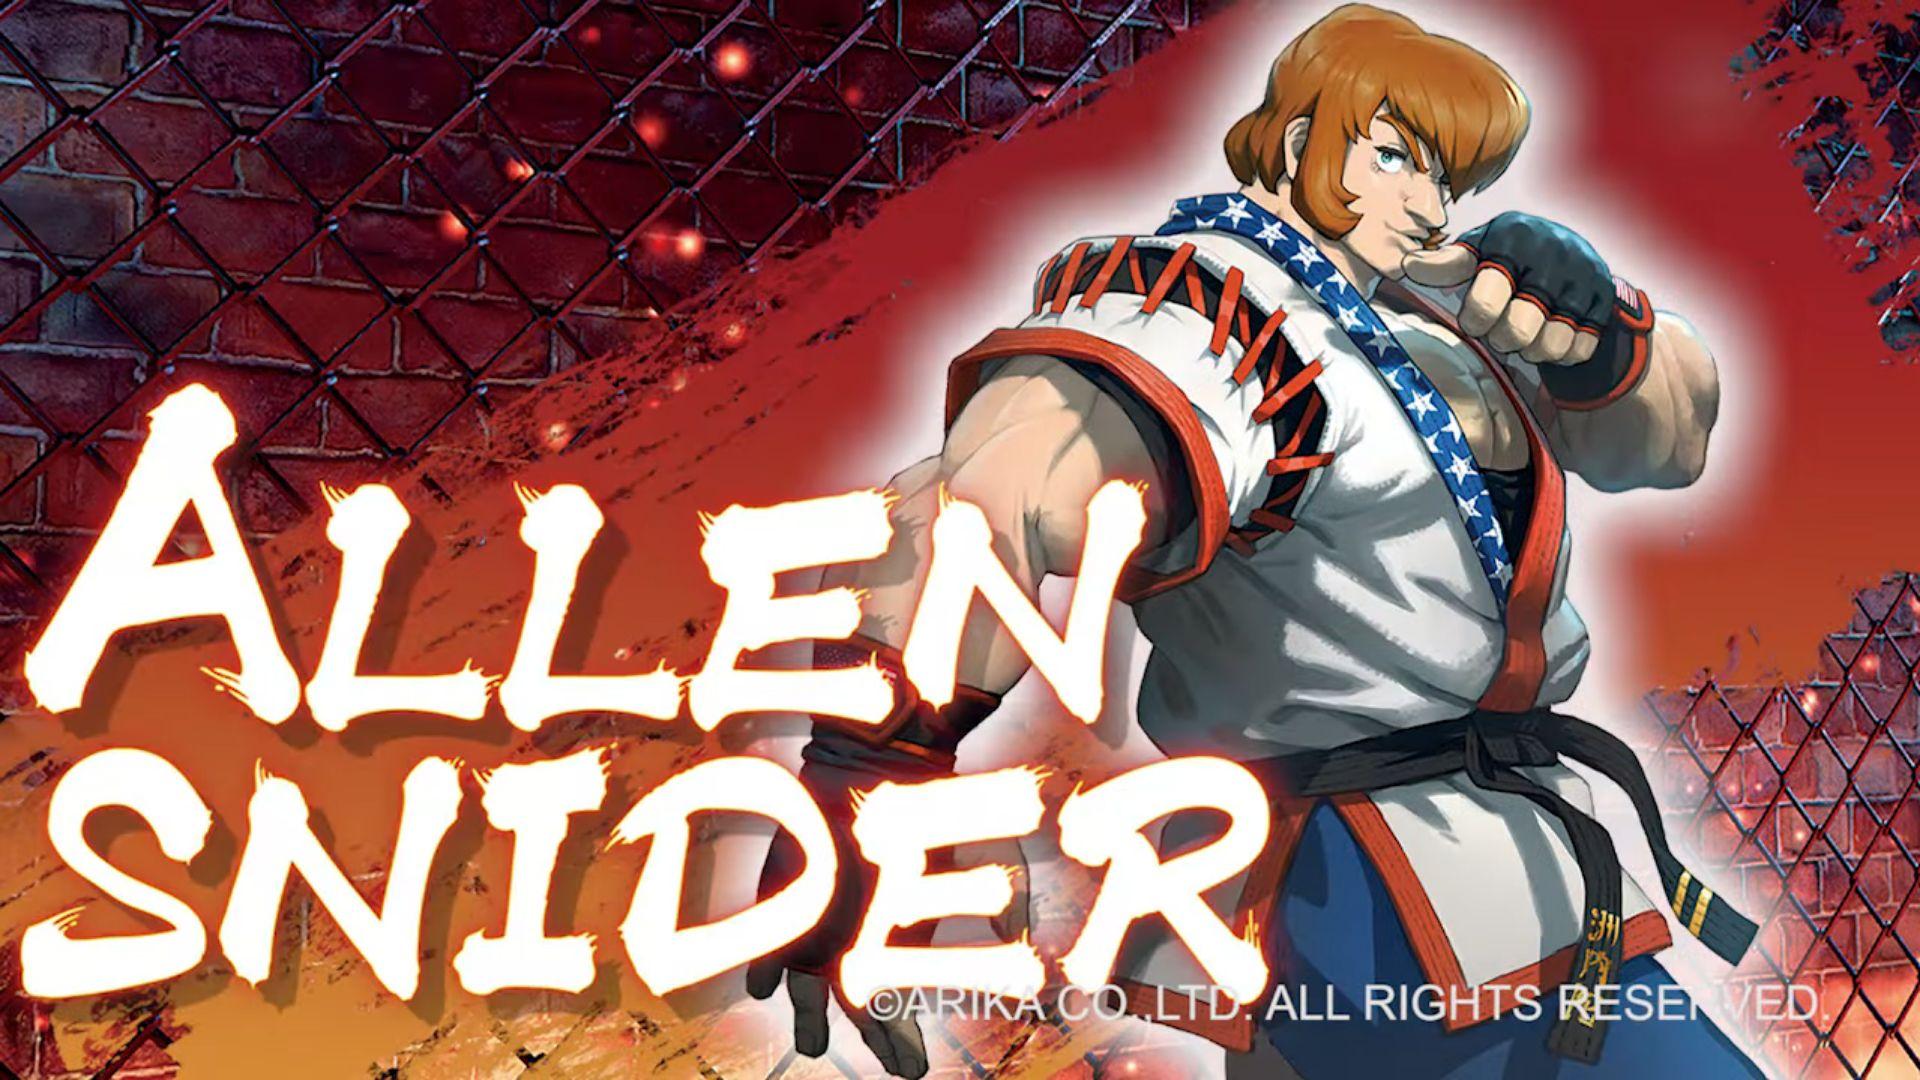 Allen Snider Arika